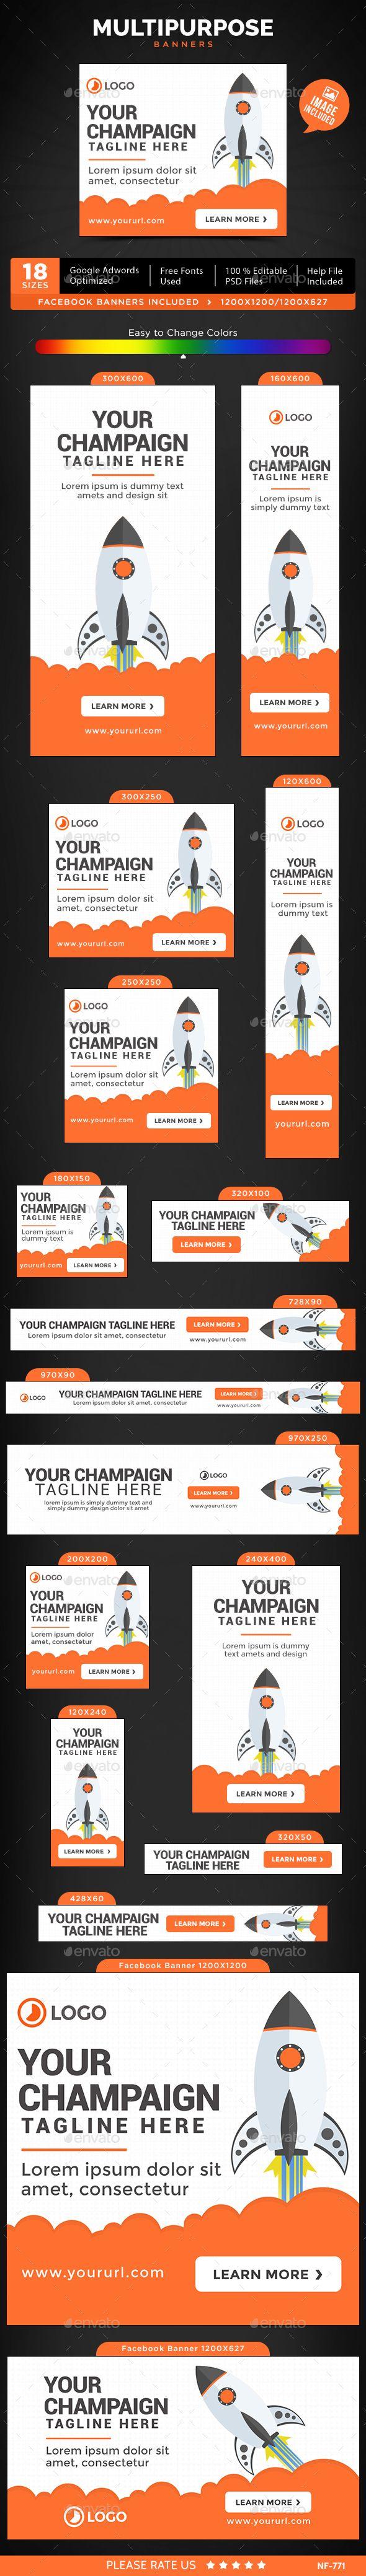 Multipurpose Web Banners Template PSD #ads #design Download: http://graphicriver.net/item/multipurpose-banners/13420370?ref=ksioks